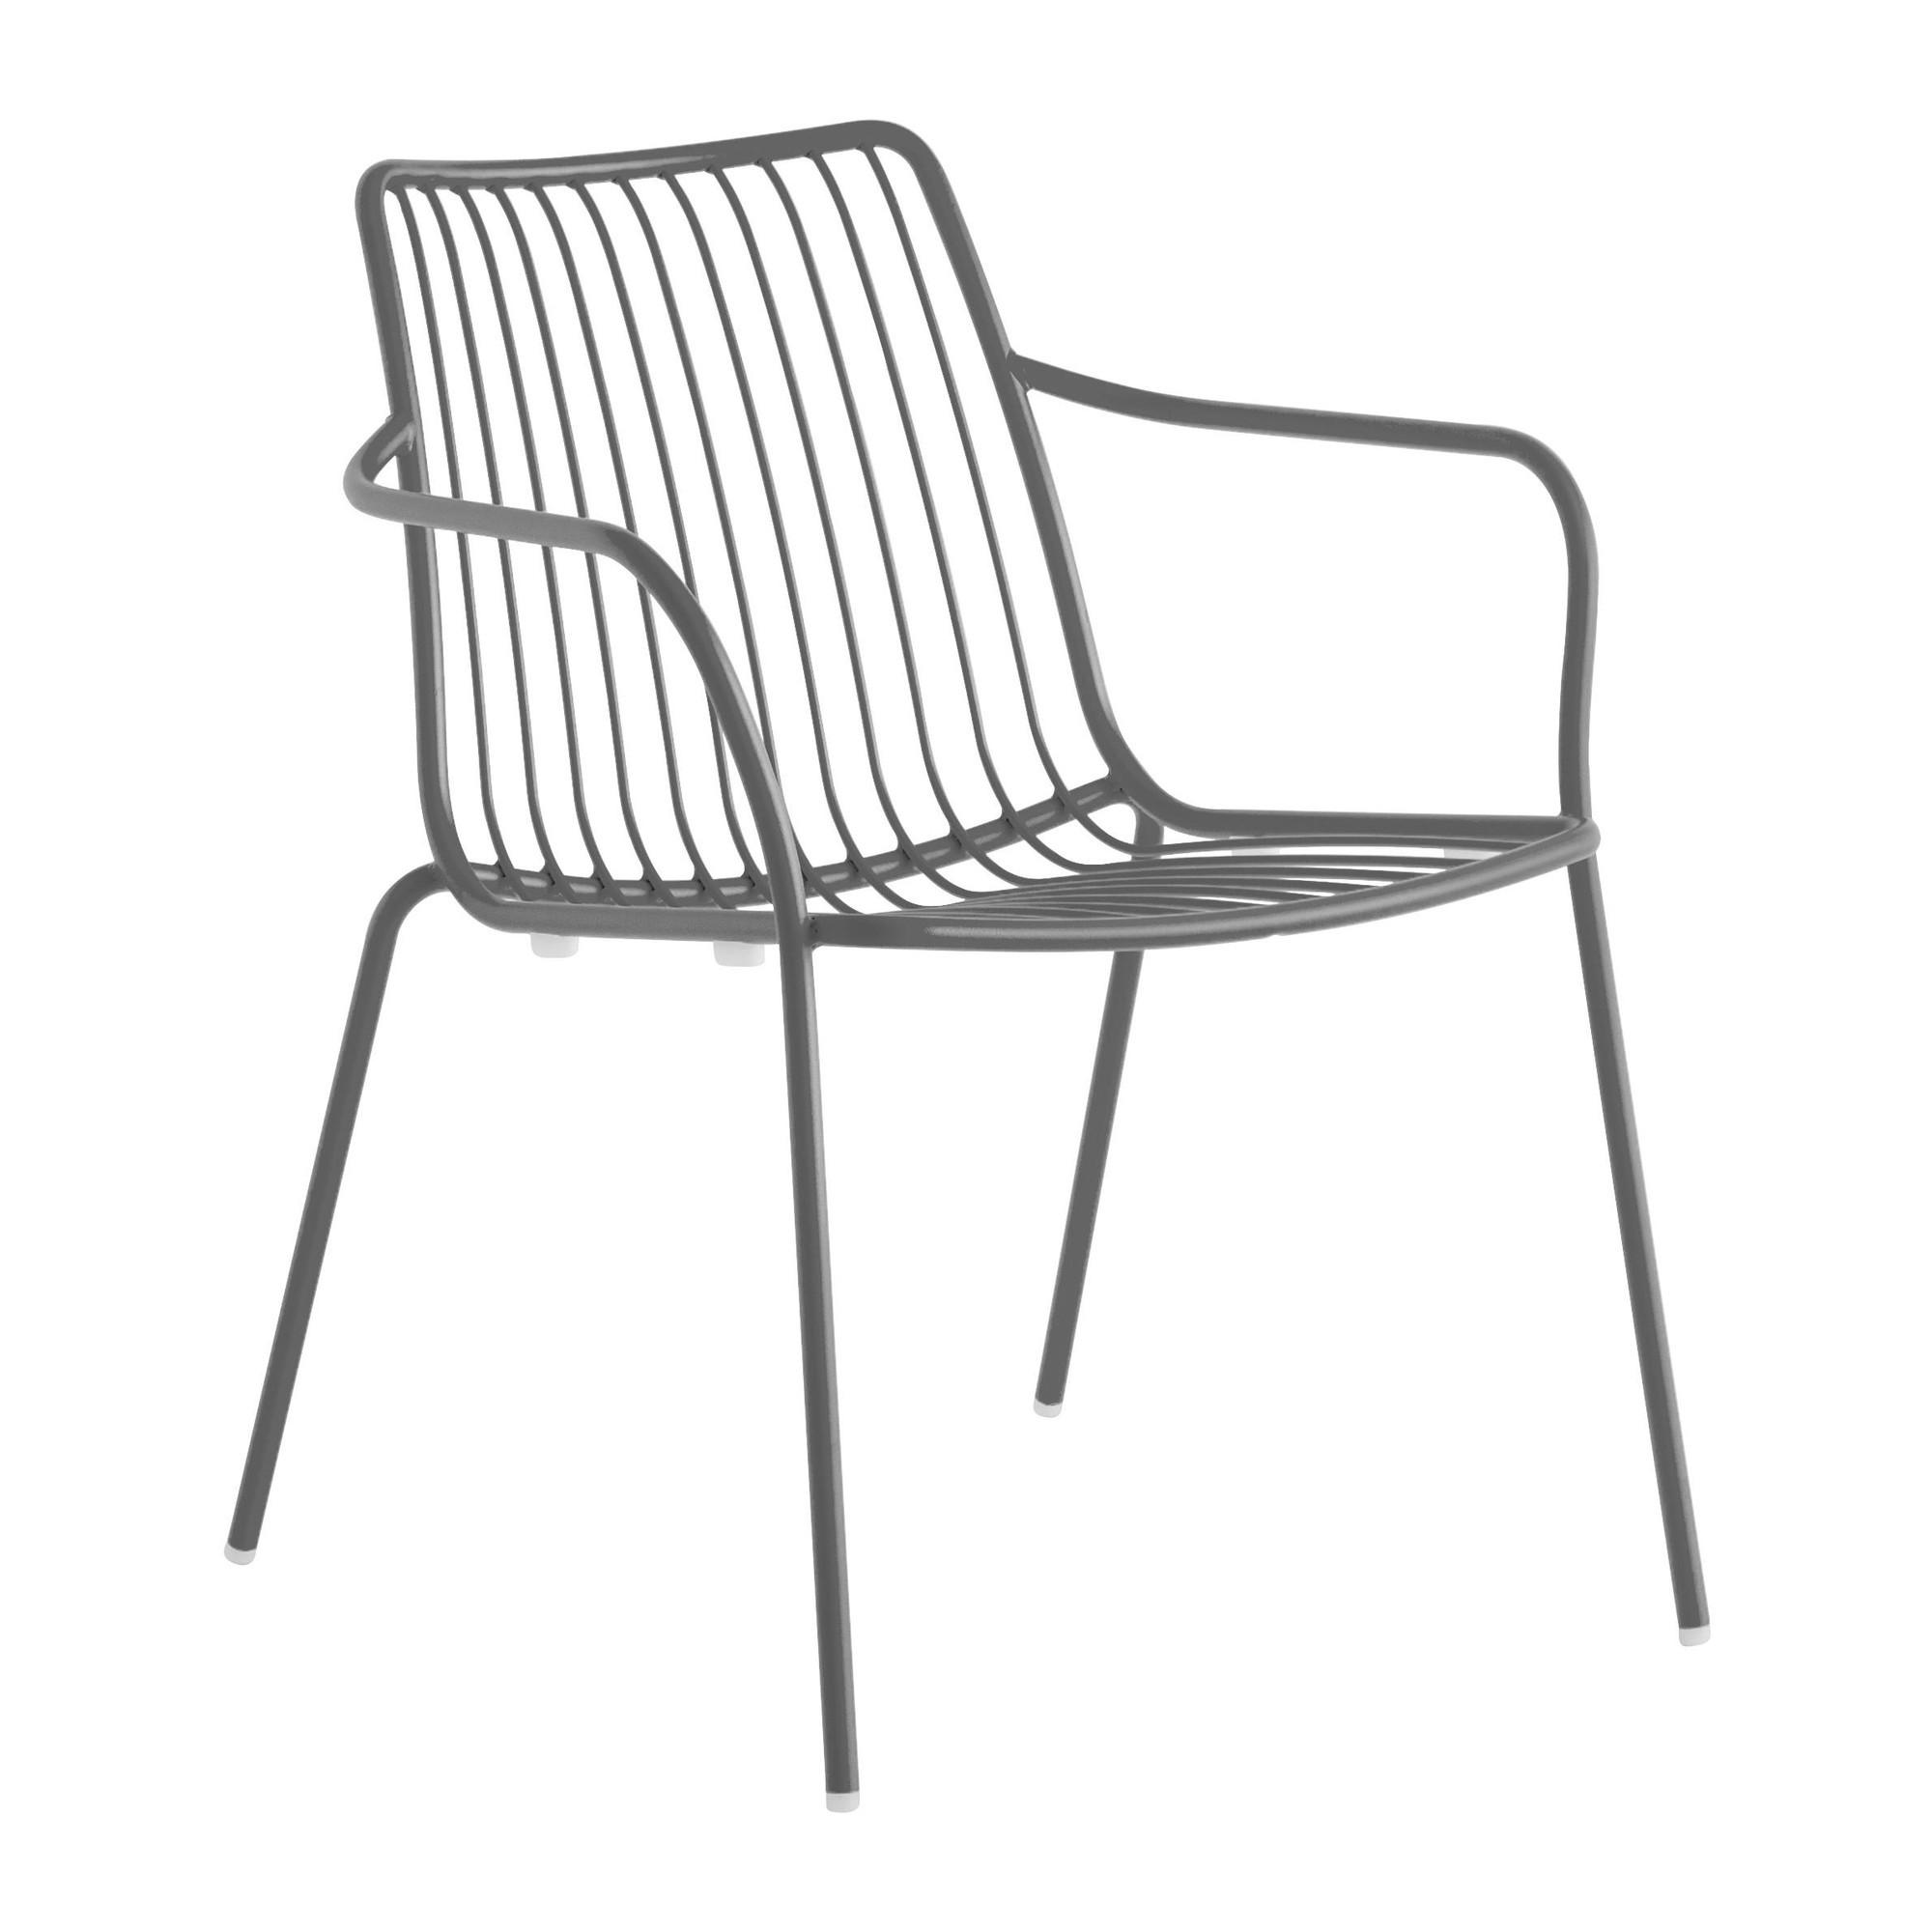 Nolita 3659 Lounge Garden Chair